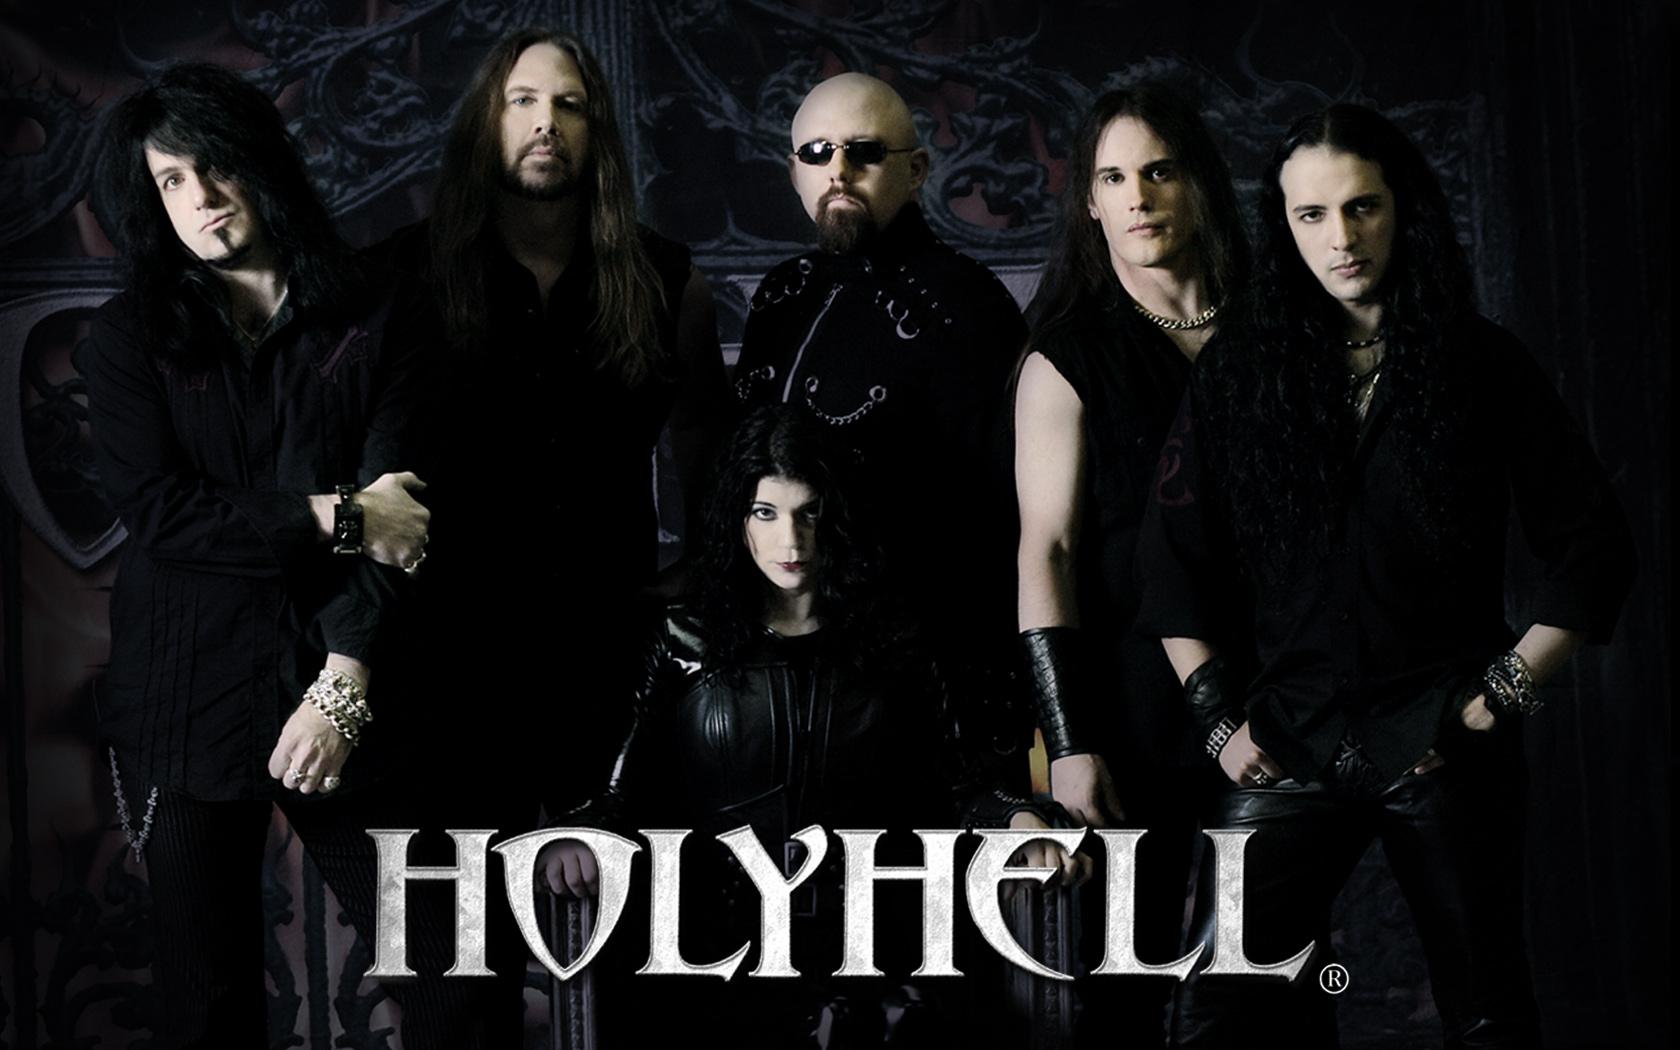 HolyHell